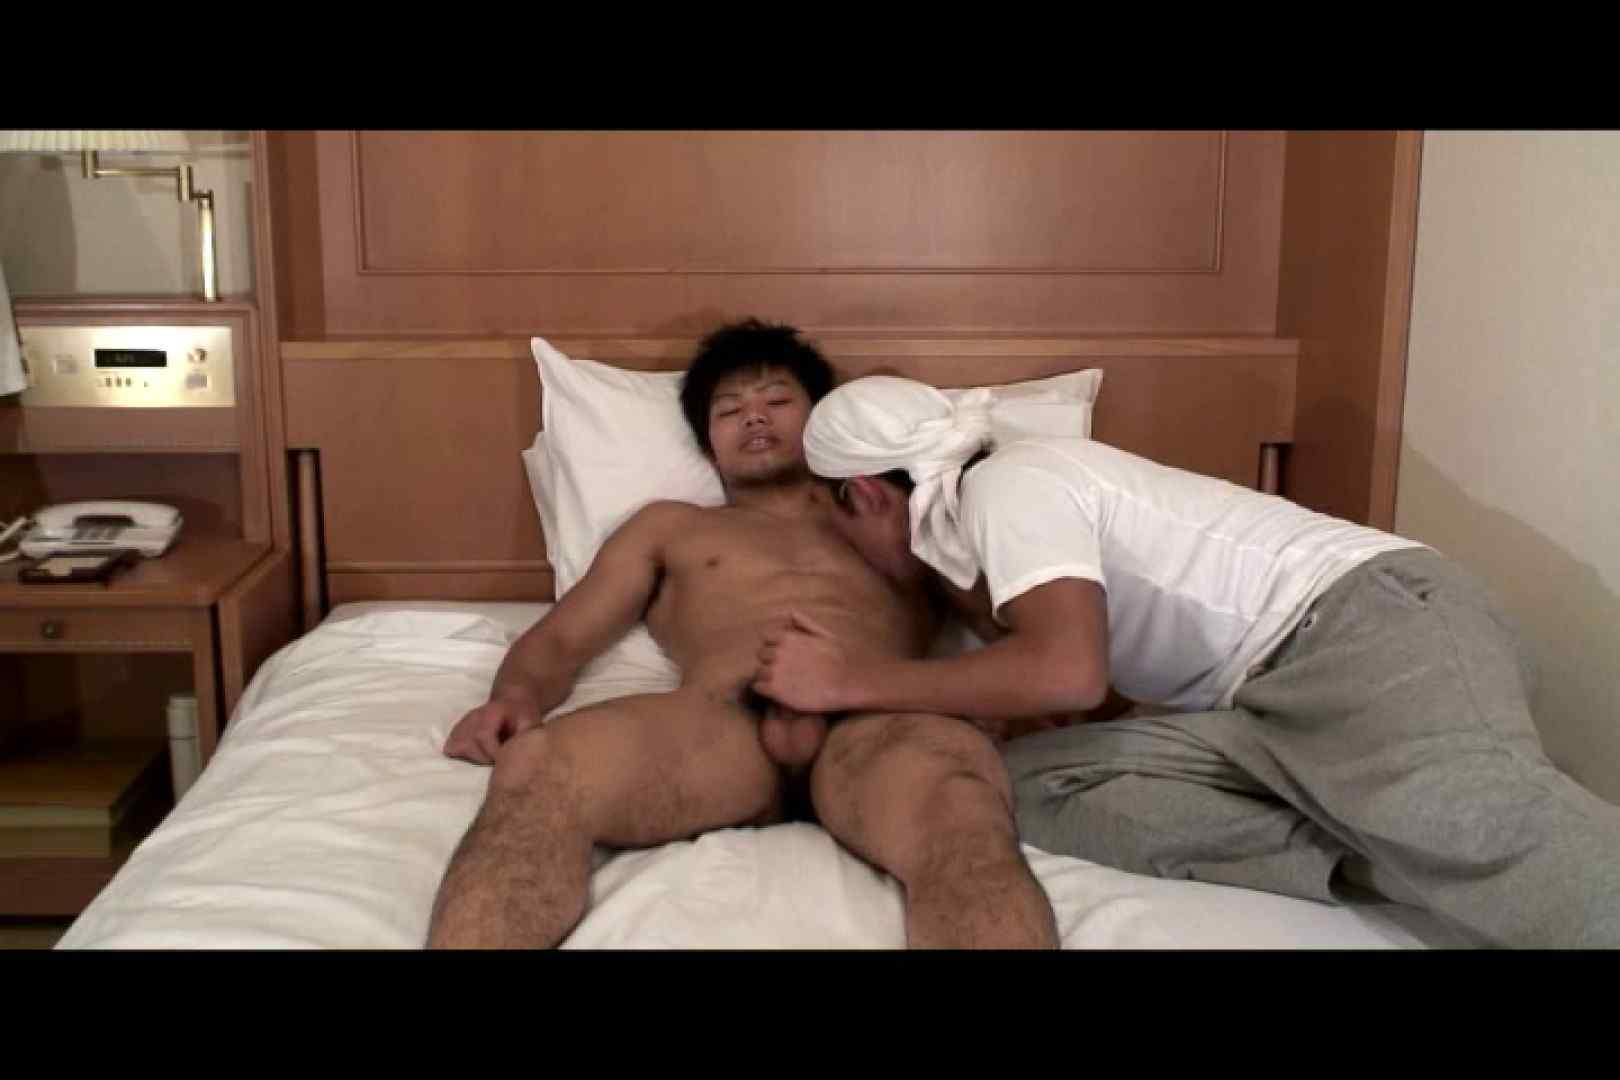 Bistro「イケメン」~Mokkori和風仕立て~vol.02 スポーツマン  57pic 31